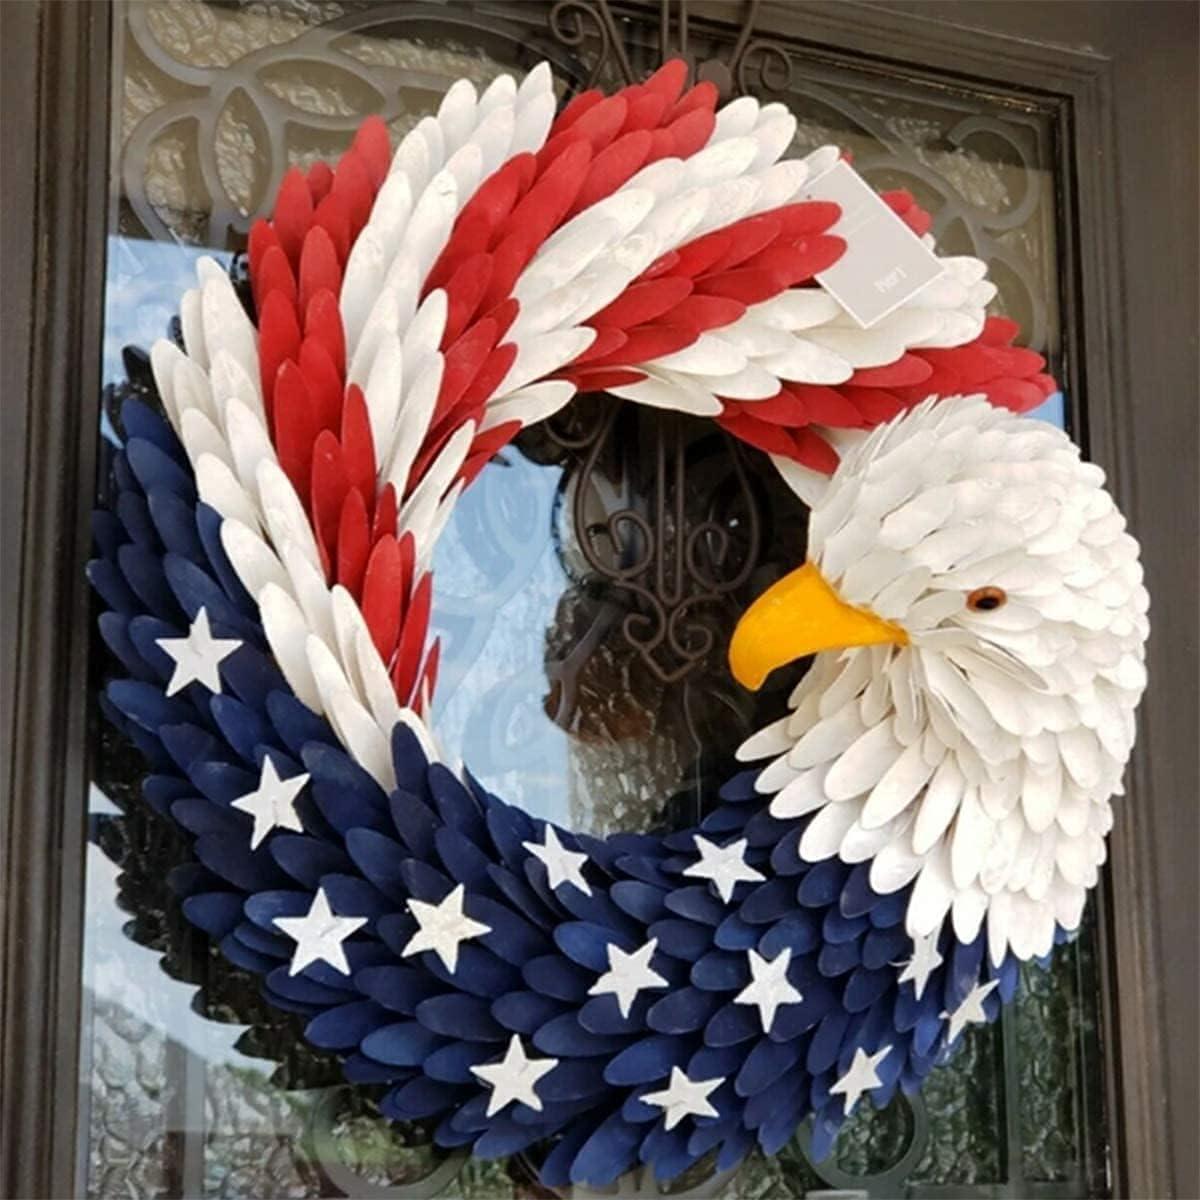 American Eagle Wreath, Americana Patriotic Wreath USA July 4th Wreath, Glory Patriotic American Flag Wreath for Front Door Window Wall Decoration (15